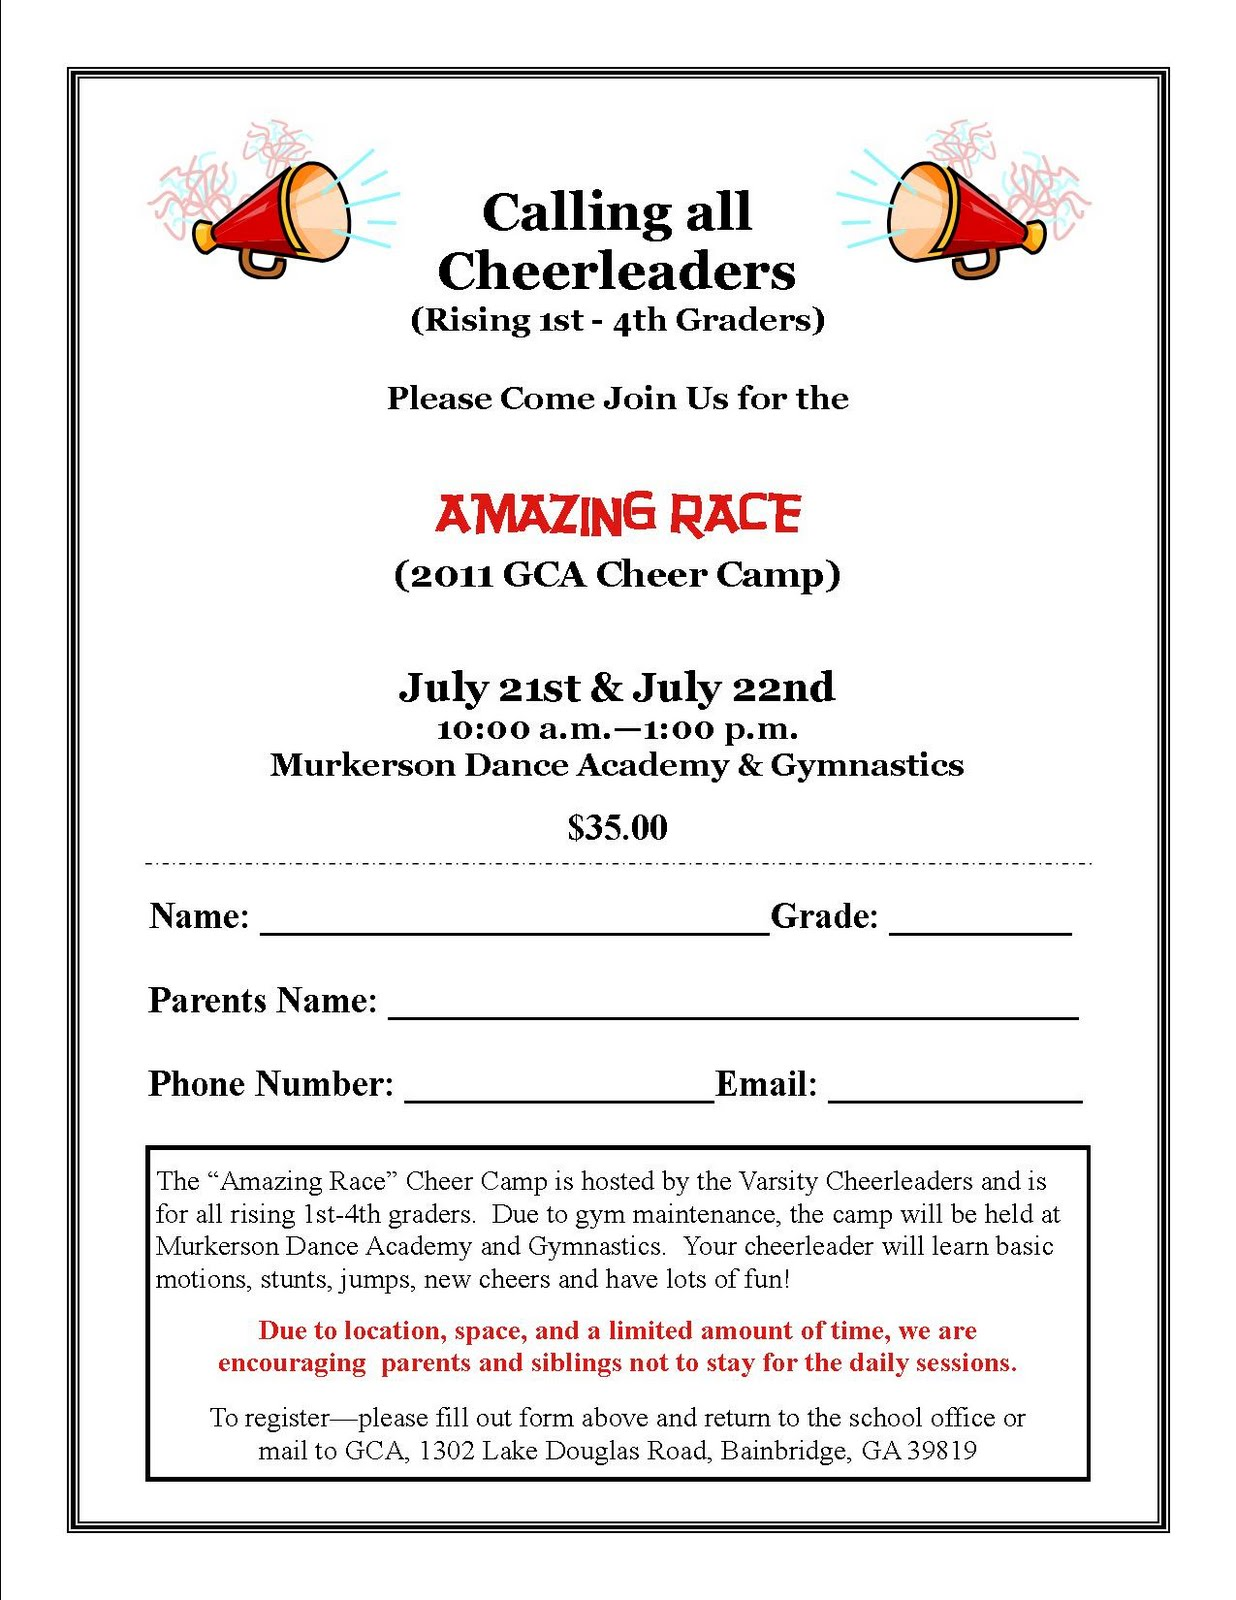 cheerleading superlatives  Grace Christian Academy: GCA Cheer Camp - July 21st